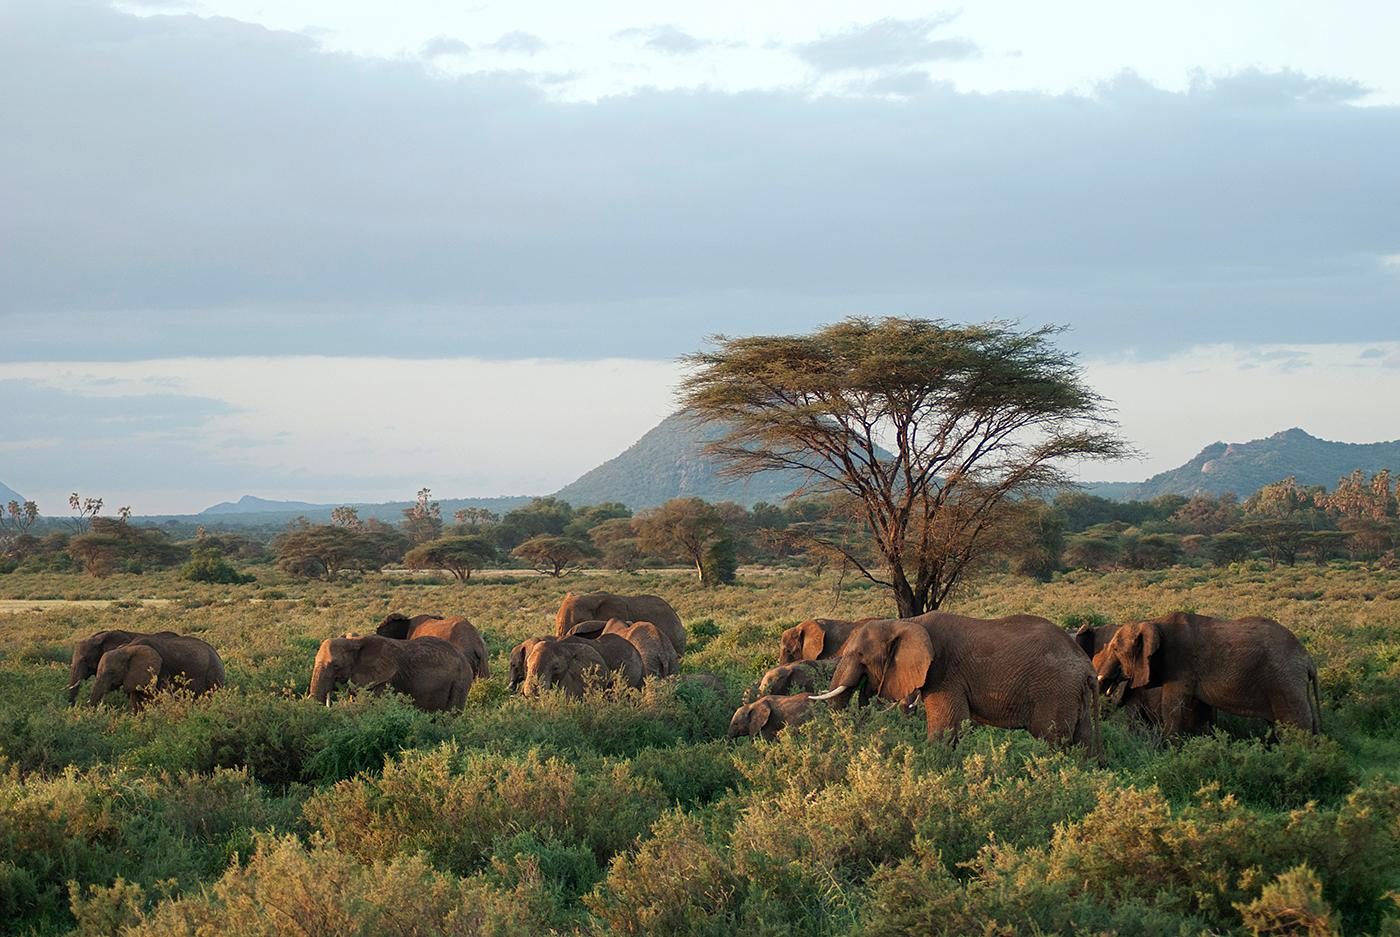 A herd of elephants in Samburu National Park, Kenya. Photo: BBC/Sarah Bright